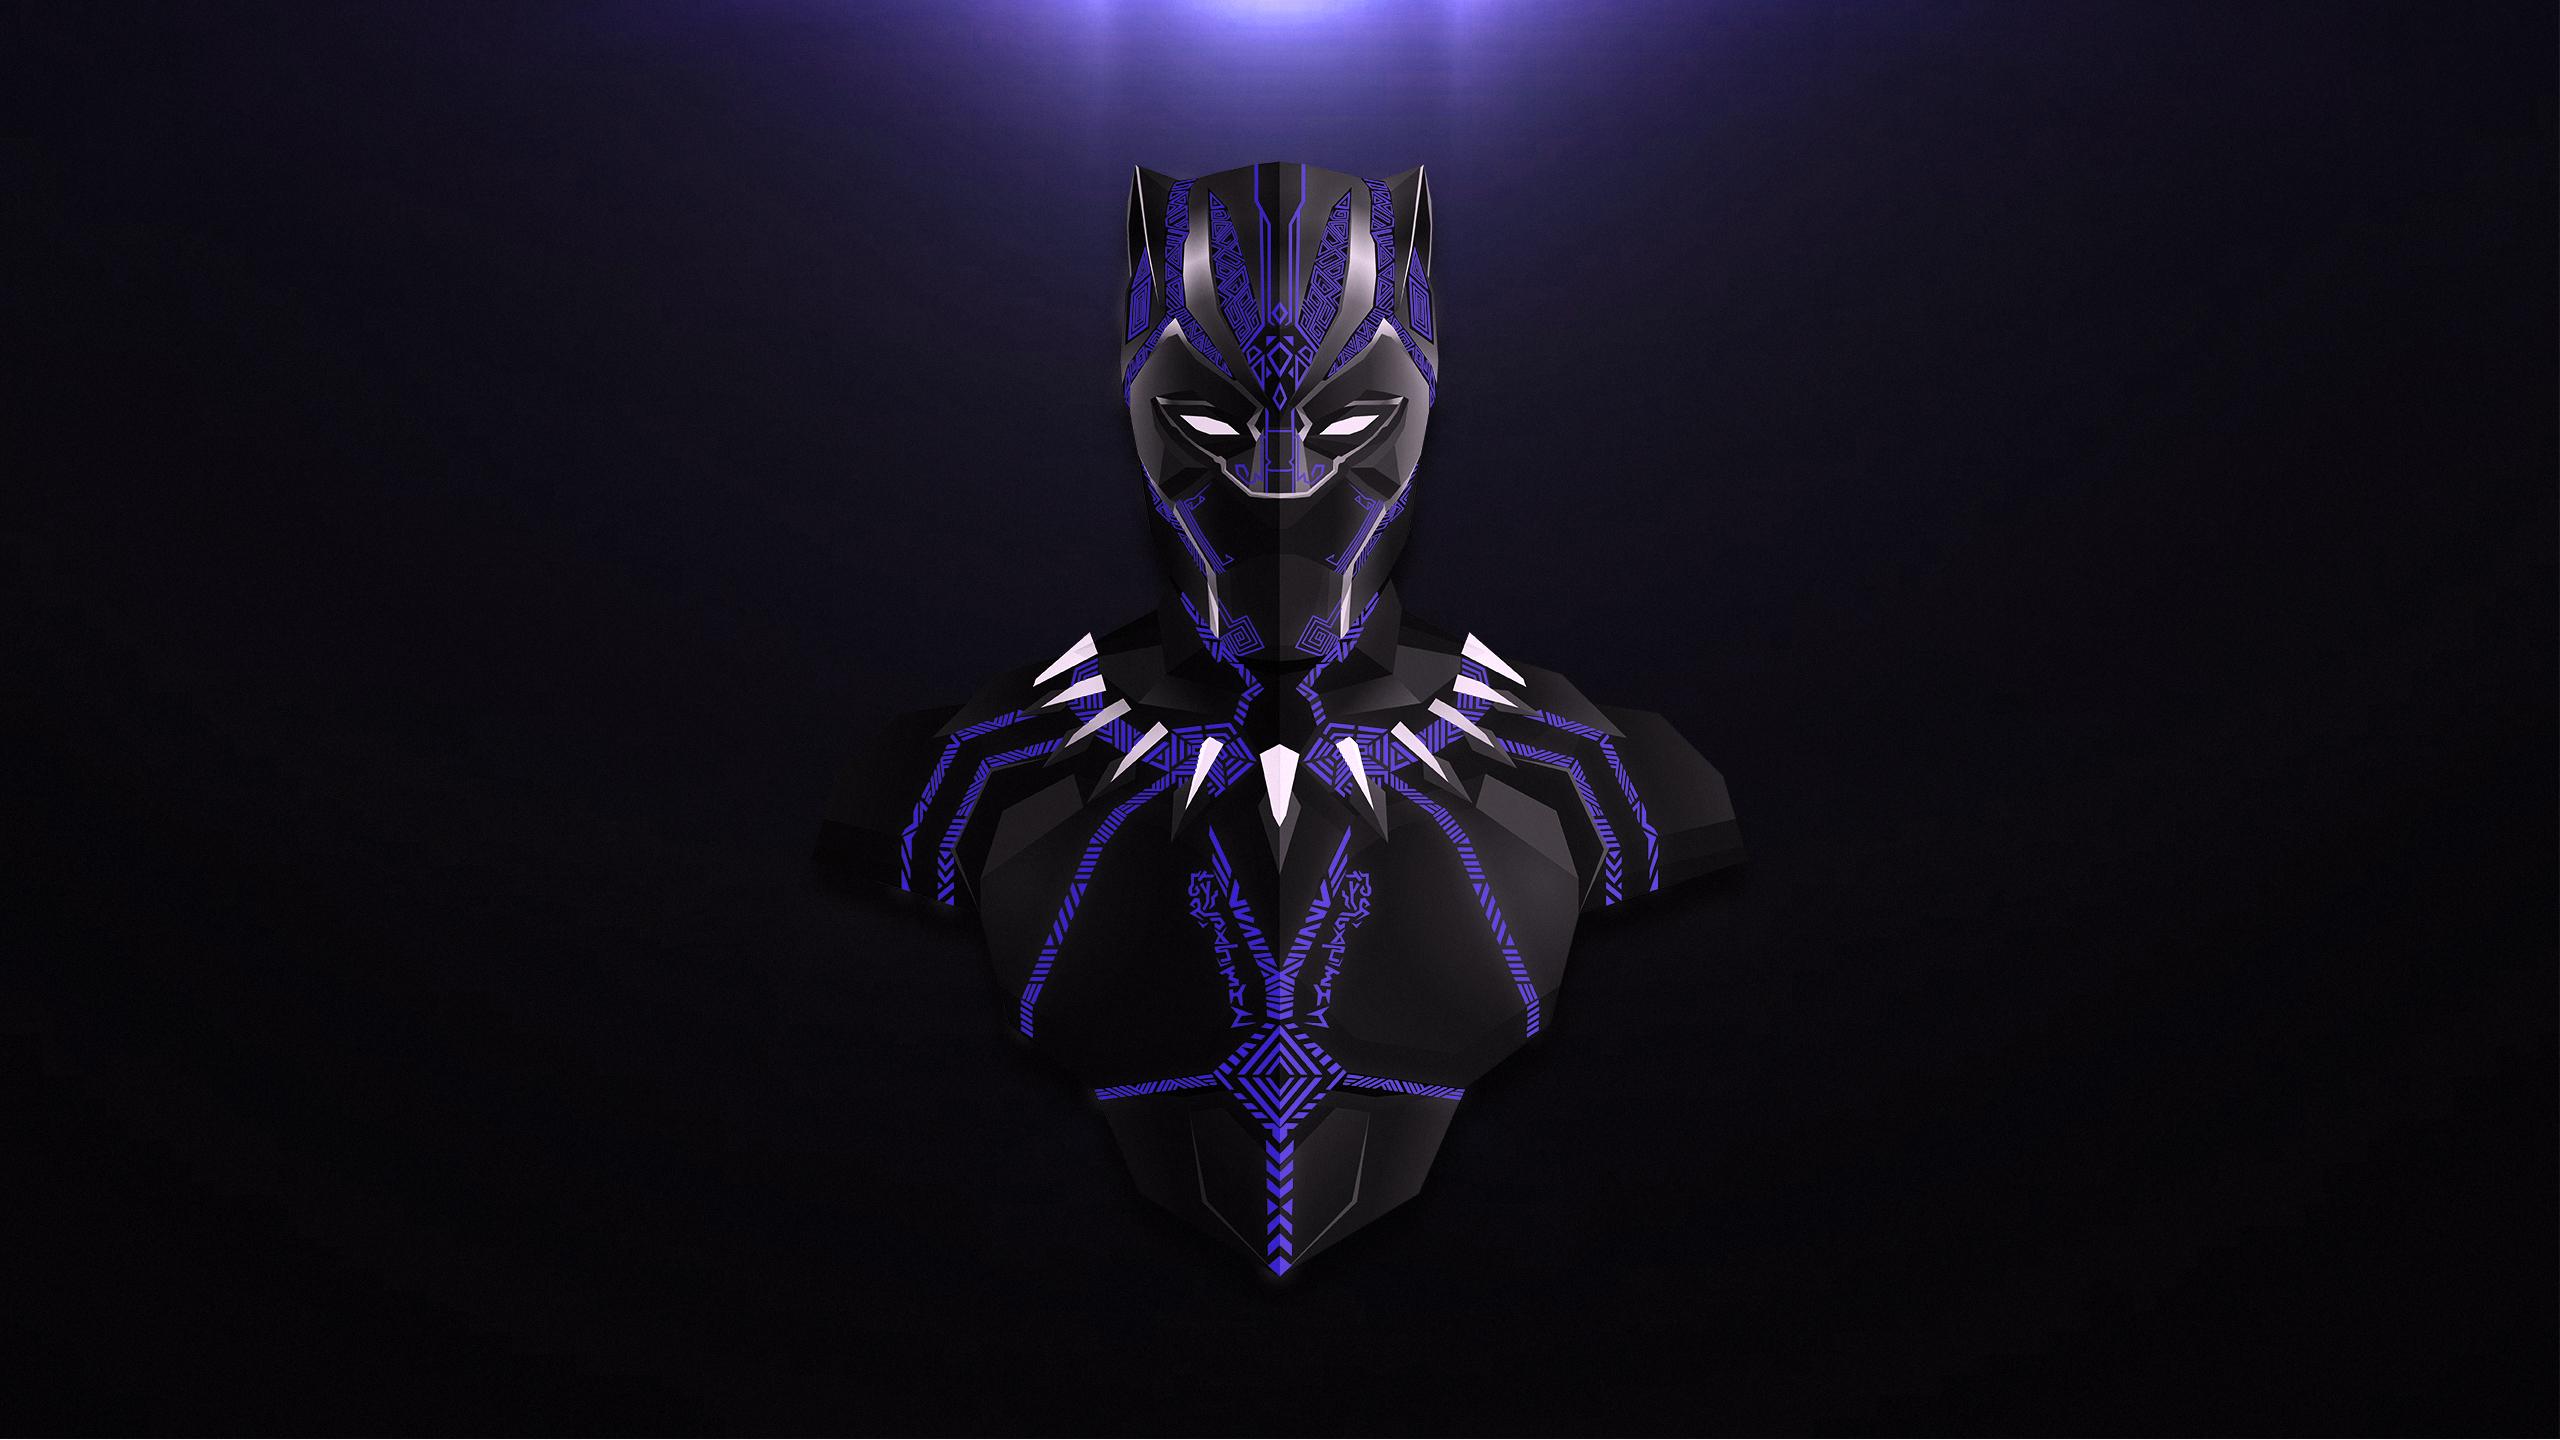 800x1280 Avengers Infinity War Black Panther Minimalism